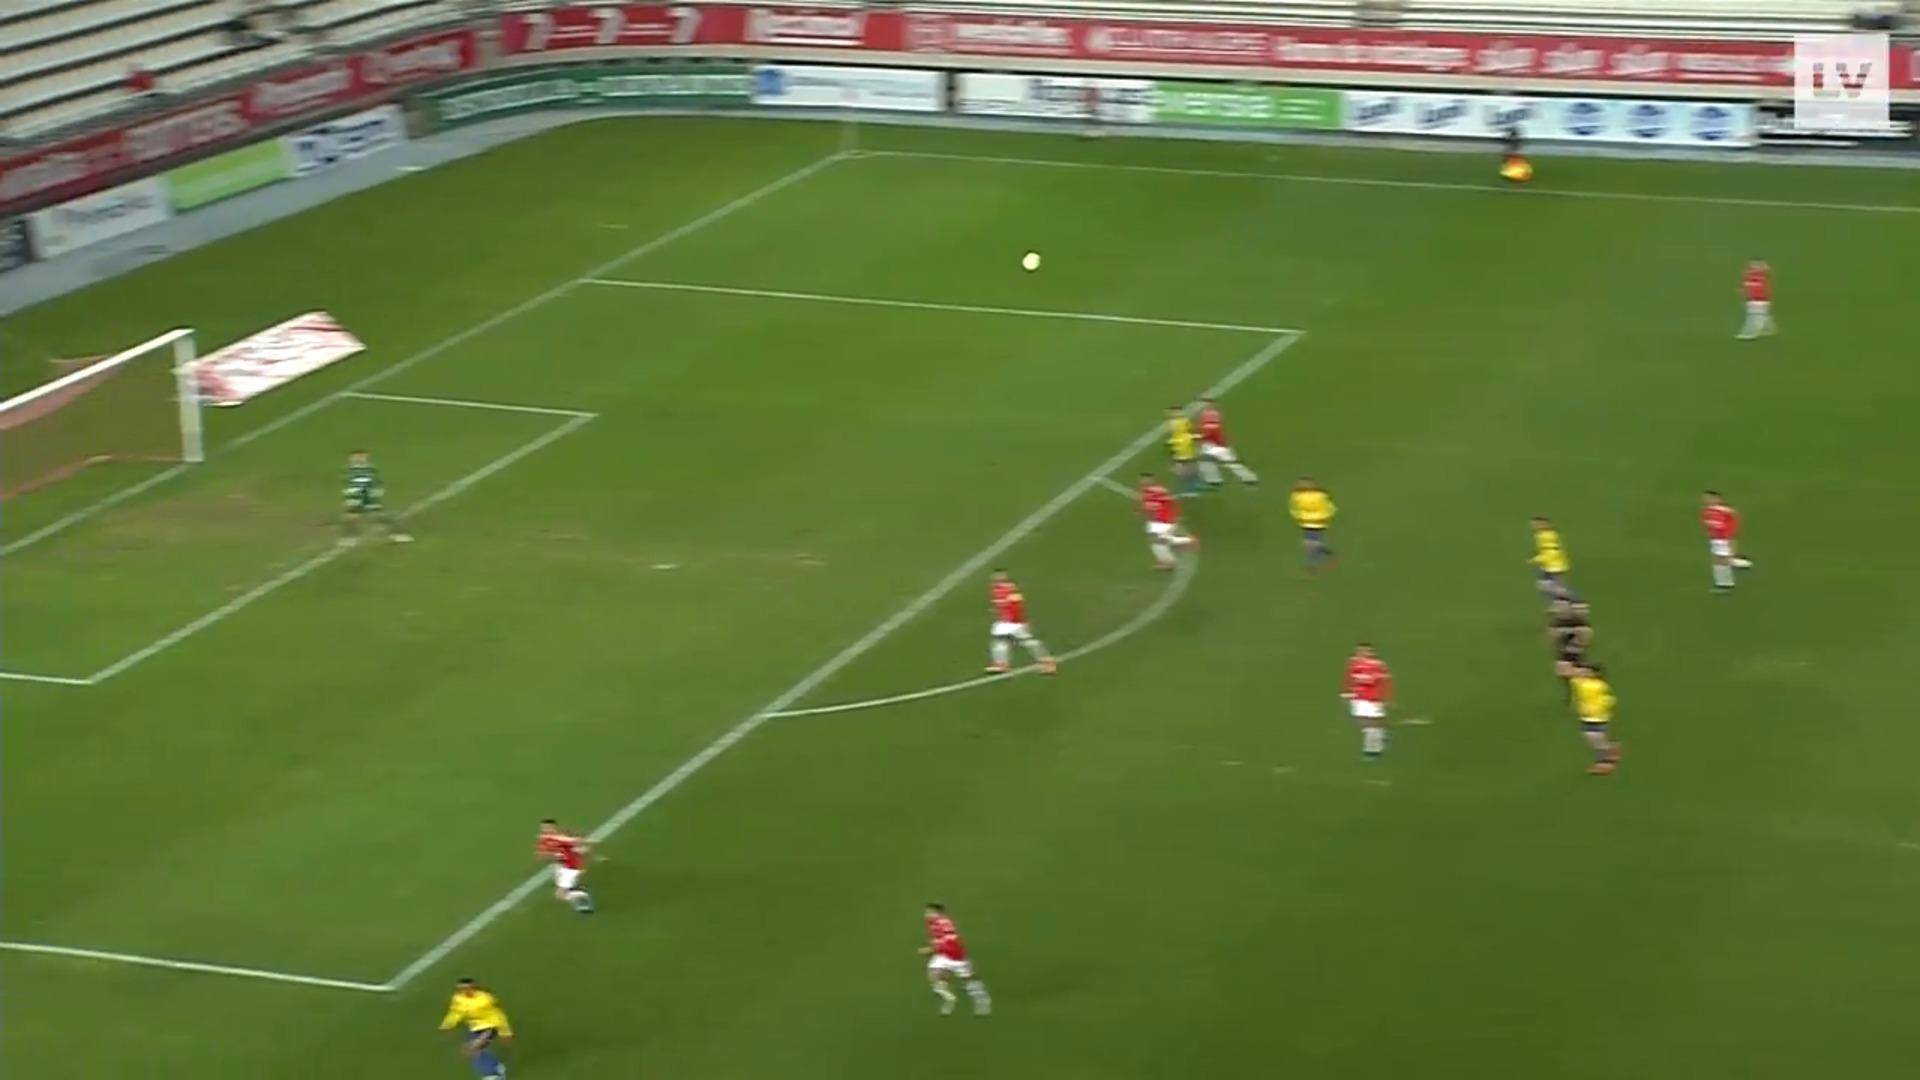 El Real Murcia vence al Cádiz B 3-1